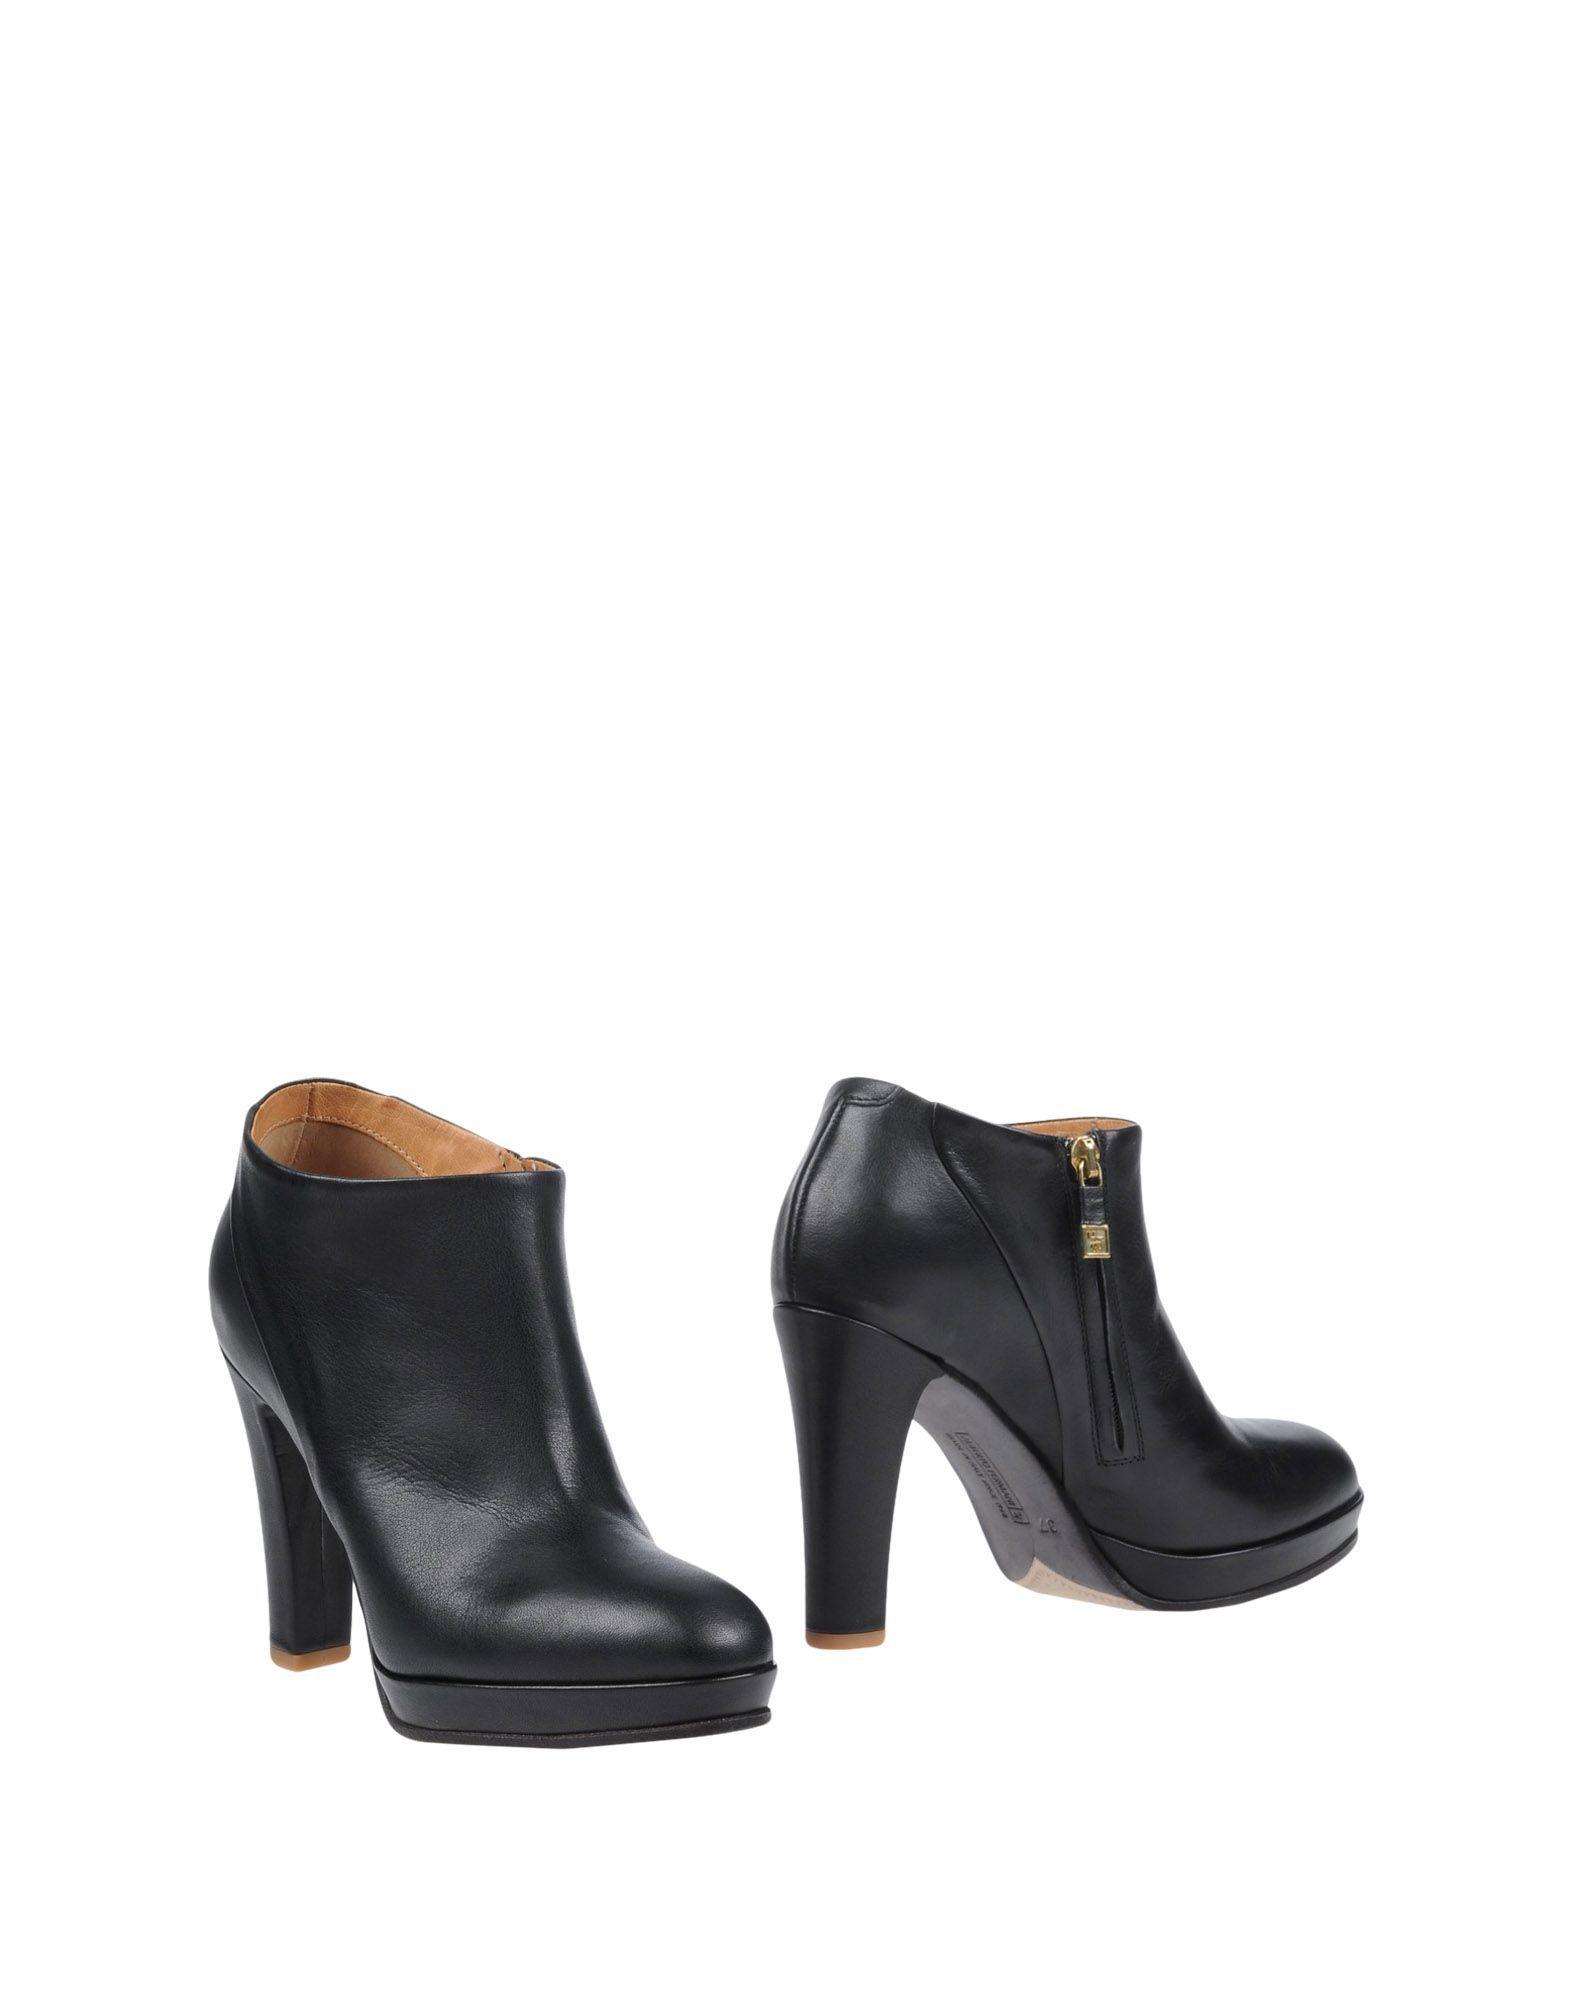 Alberto Fermani Black Leather Heeled Ankle Boots